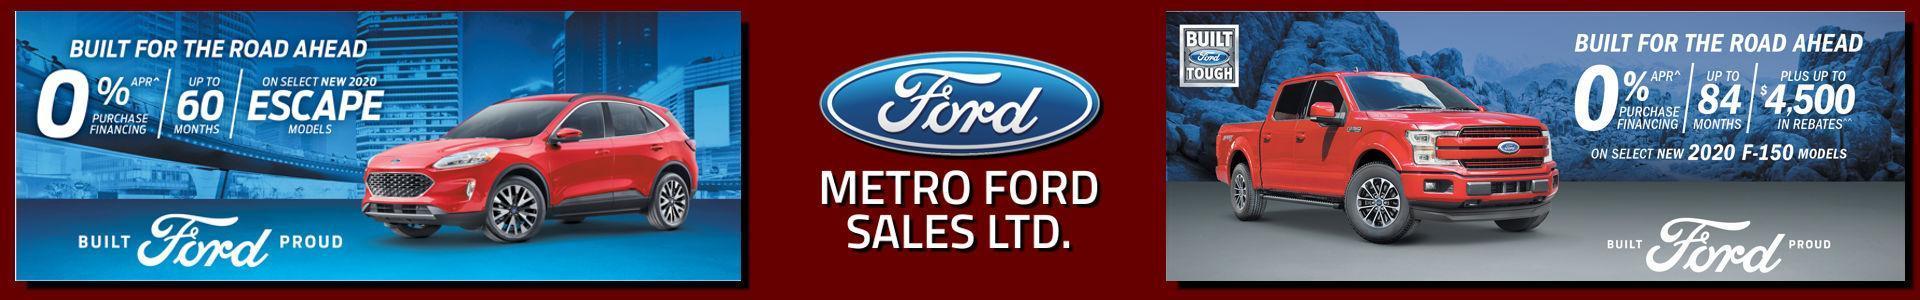 Metro Ford, Built for the Road ahead, serving Calgary, Alberta